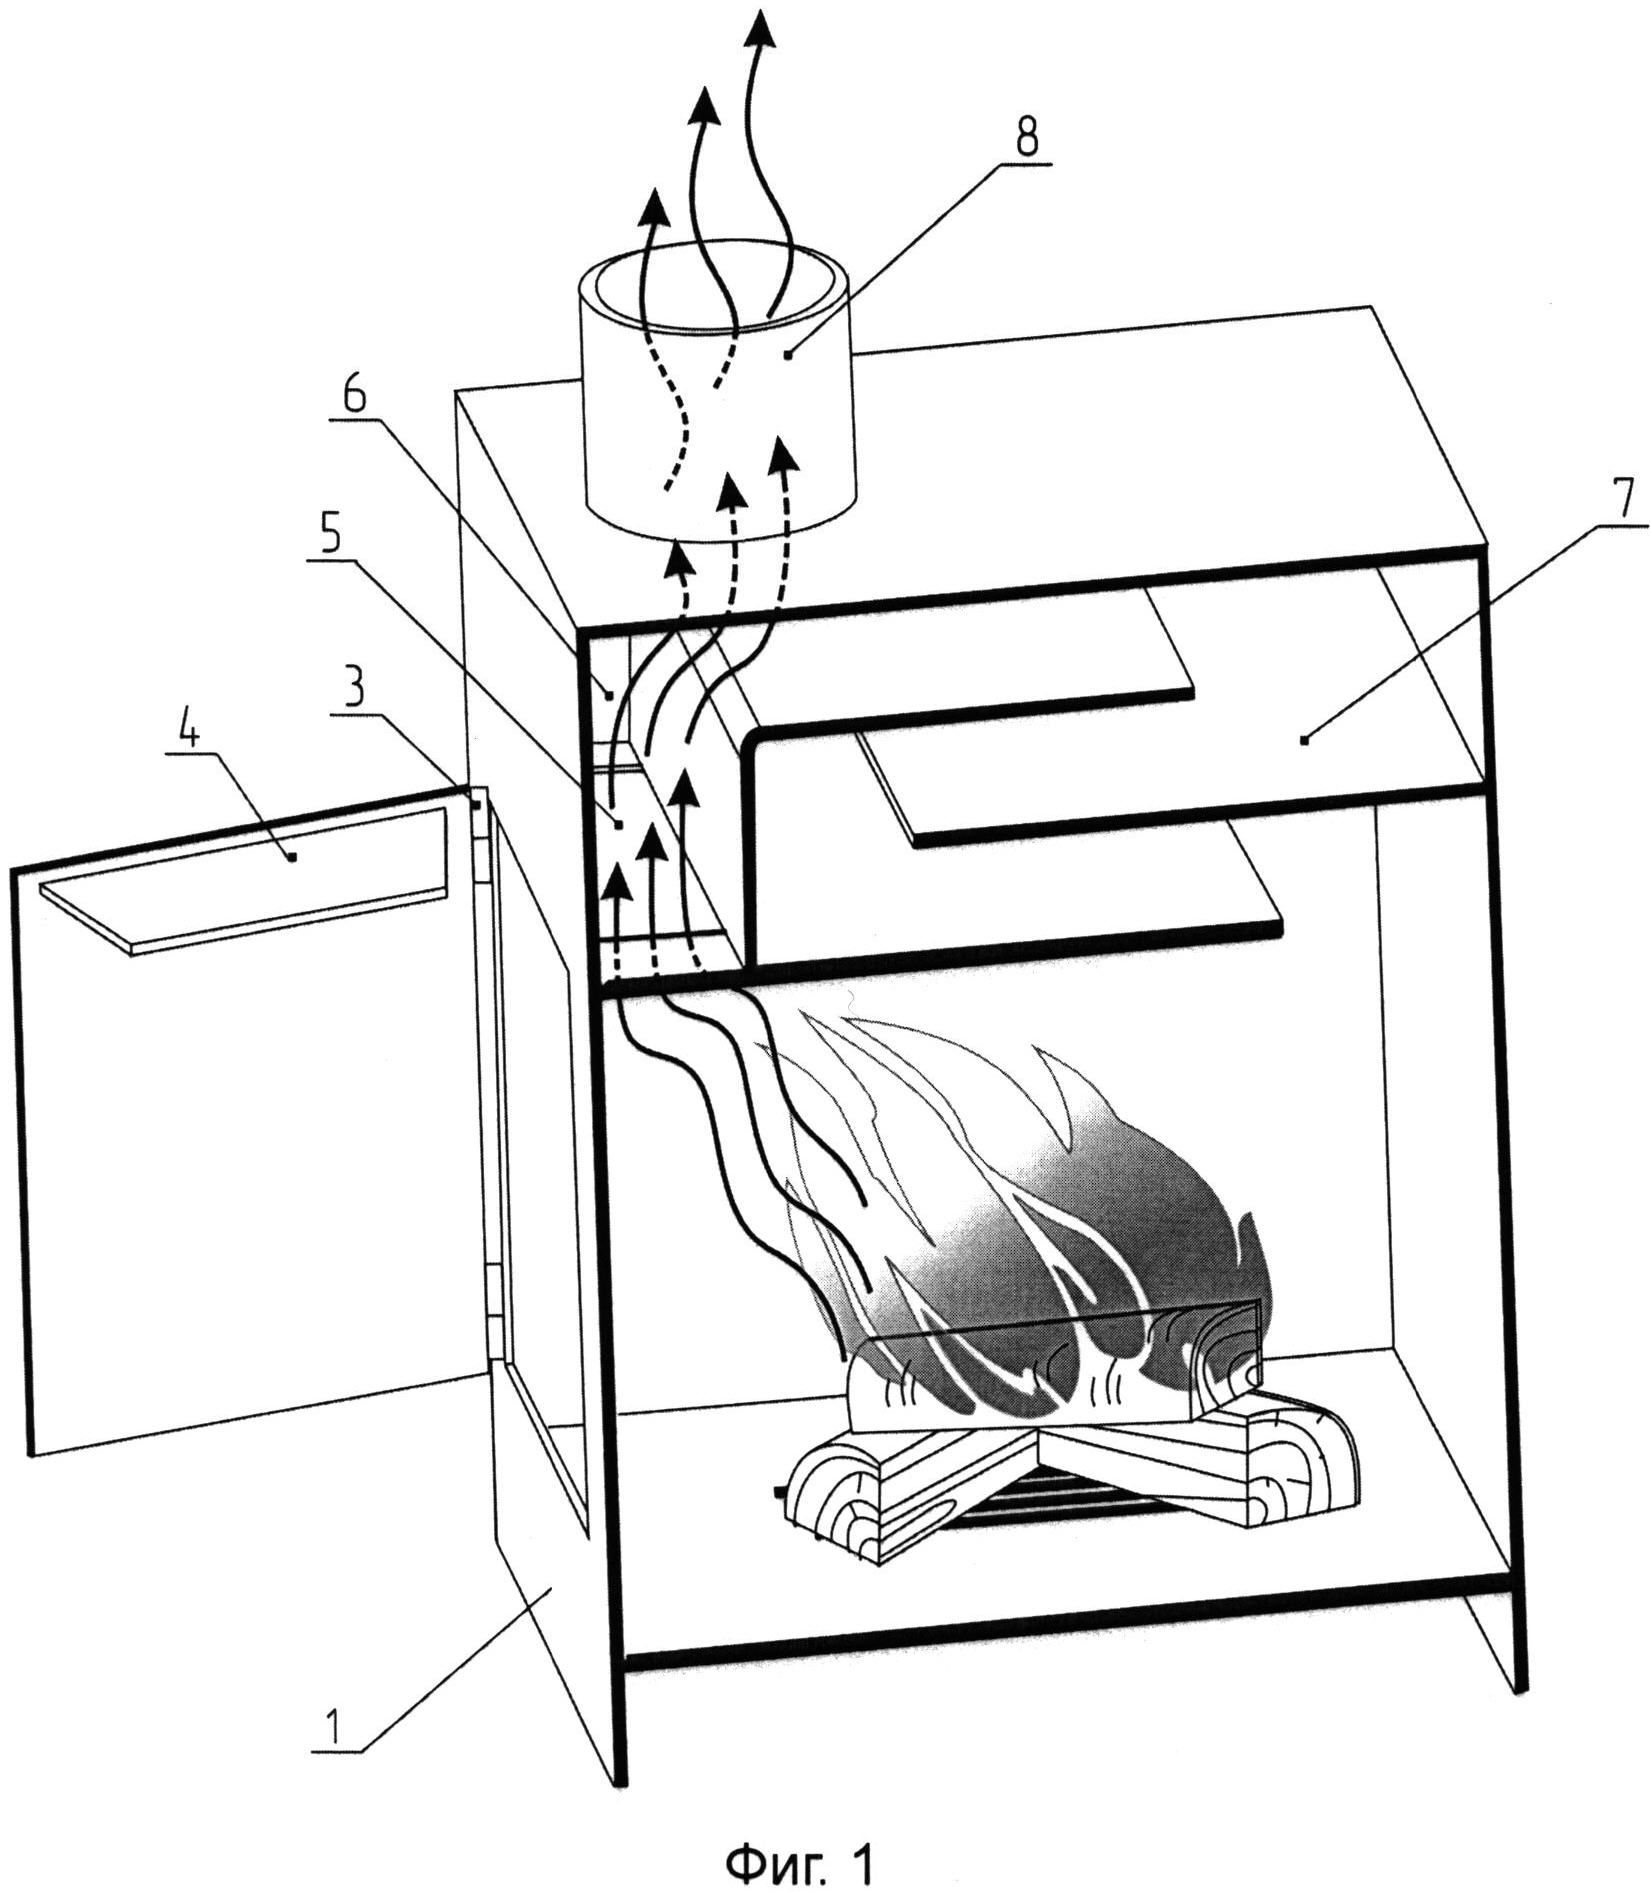 Устройство для сжигания топлива